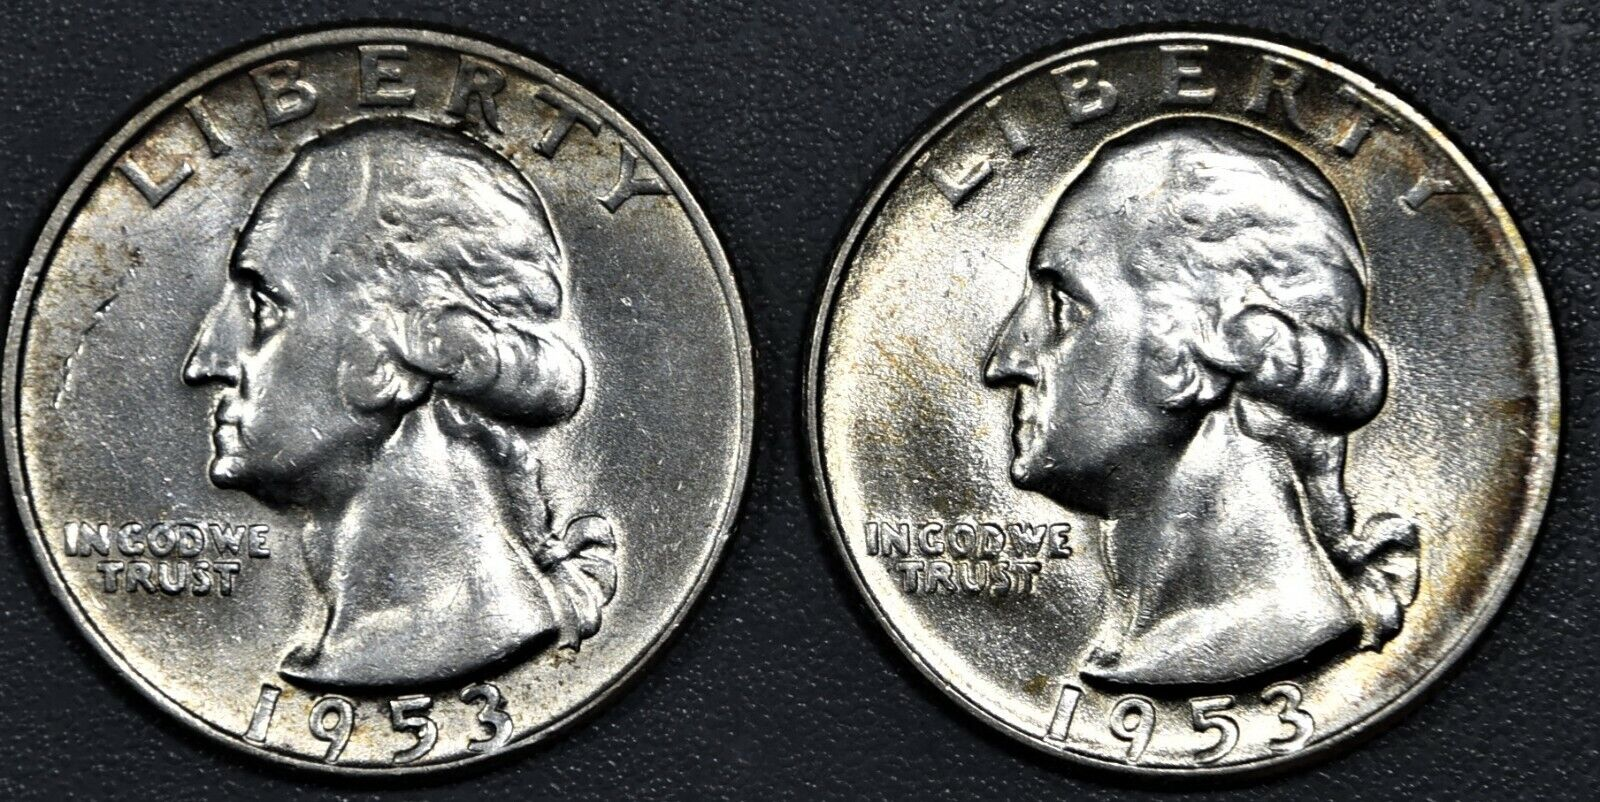 2 25c WASHINGTON SILVER QUARTERS, 1953-D BU , 1953-S AU , SKU-2871 - $14.50